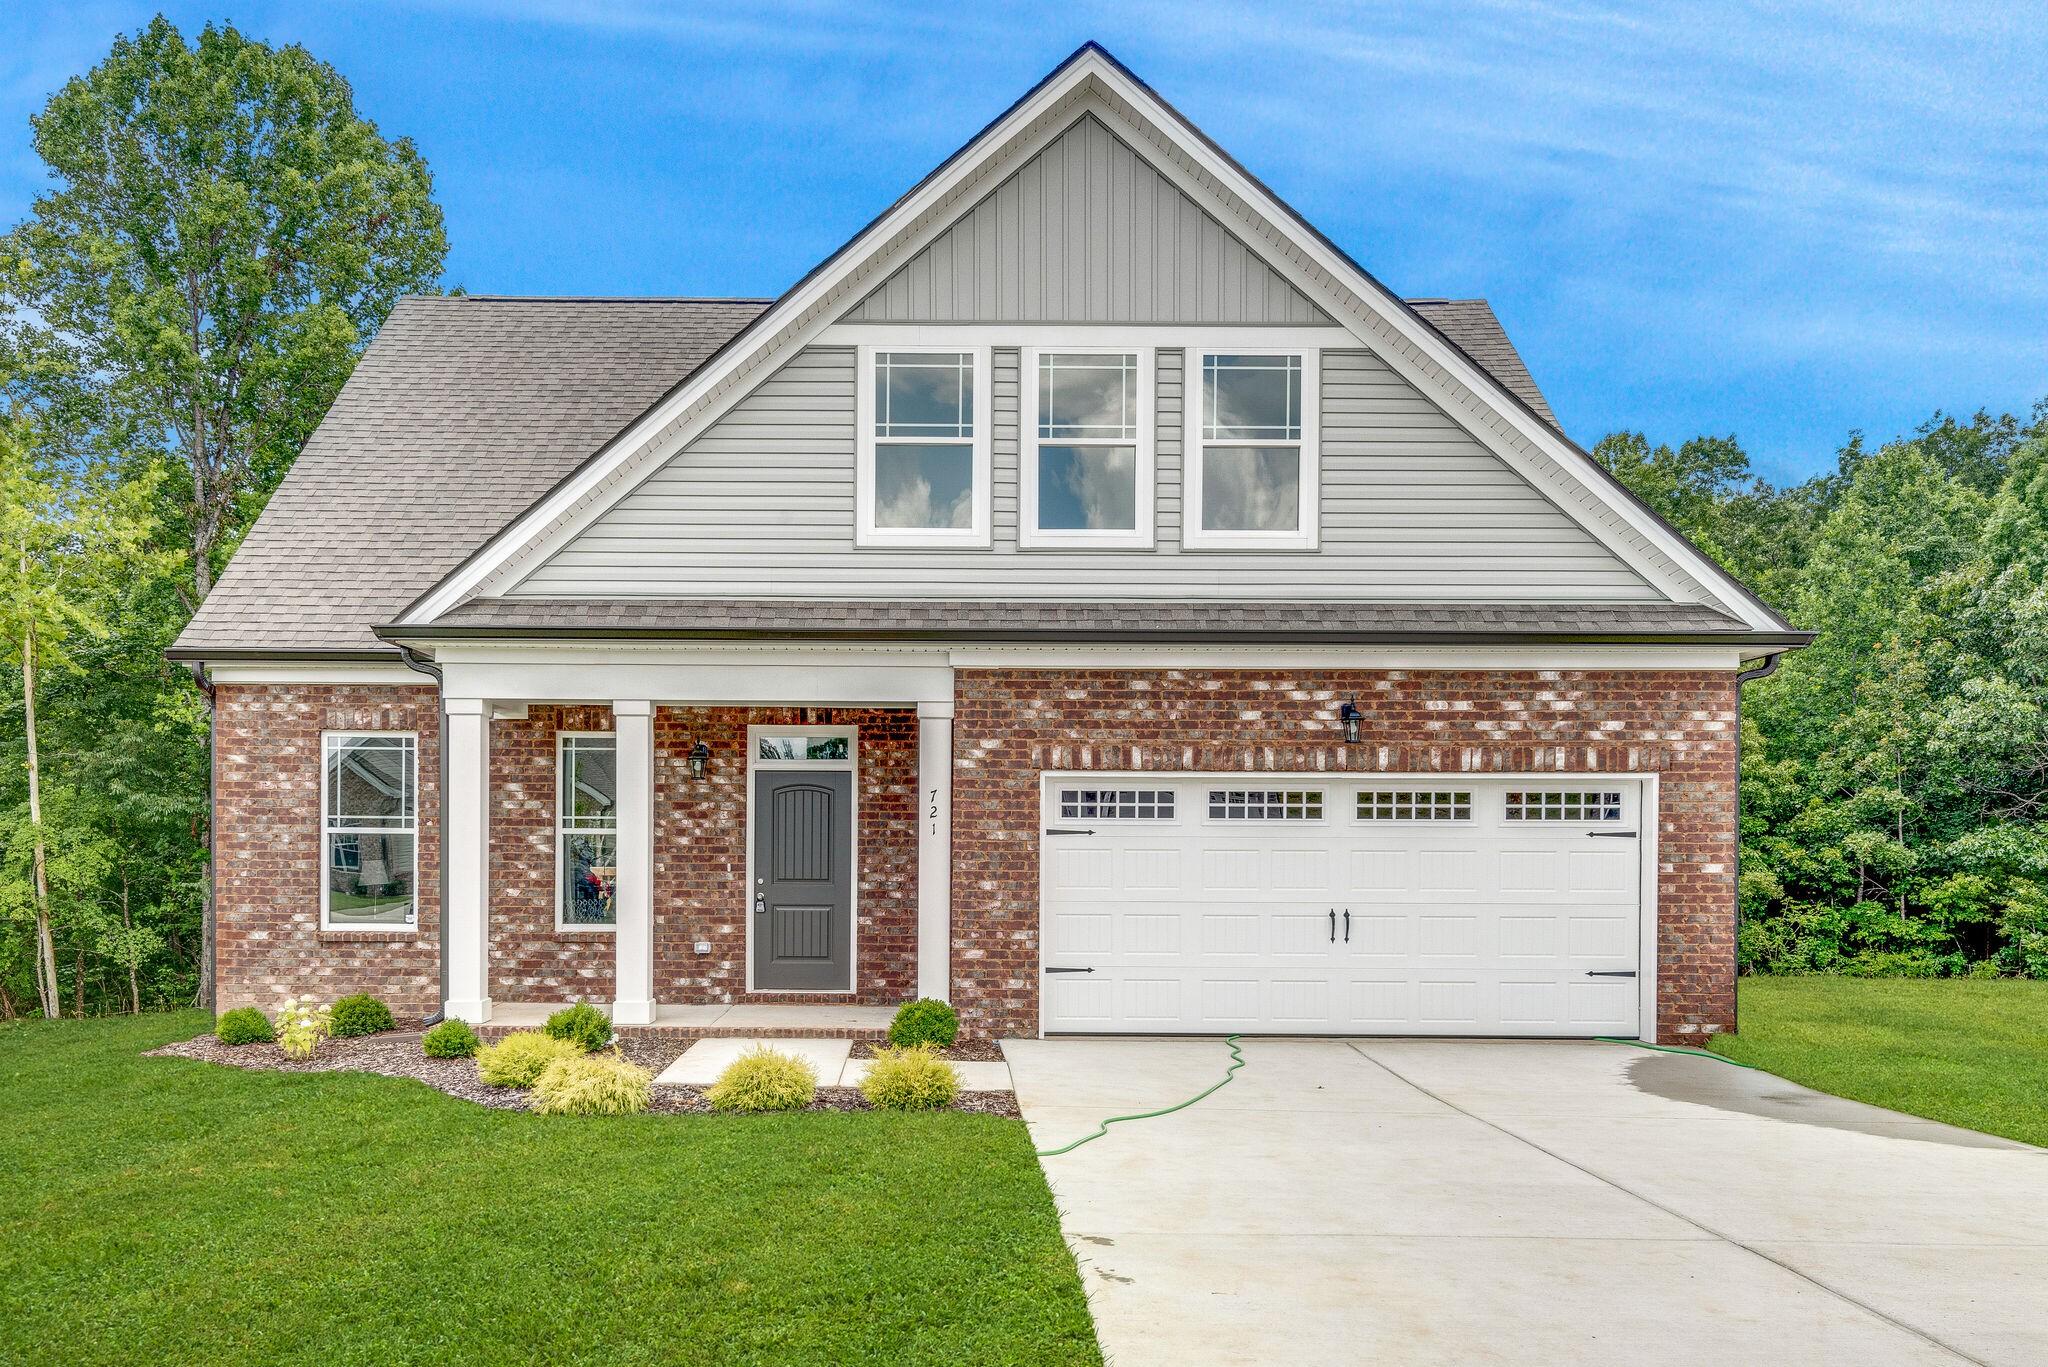 721 Monarchos Bend (Lot 98) Property Photo - Burns, TN real estate listing